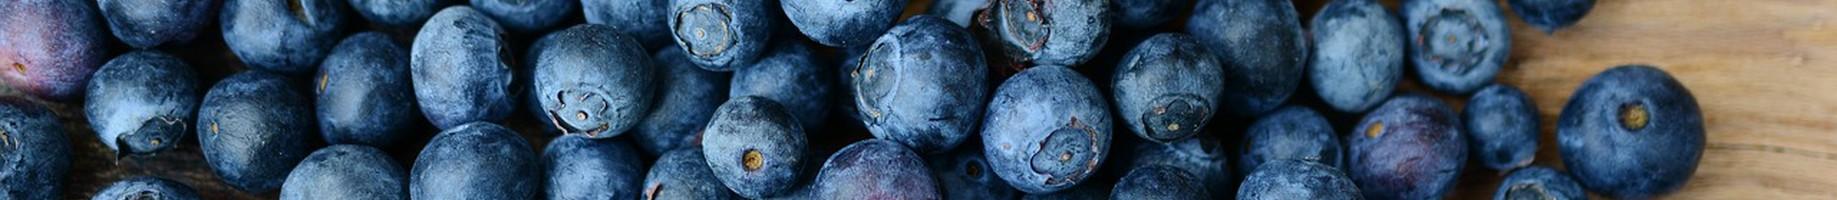 blueberries-2270379_1280